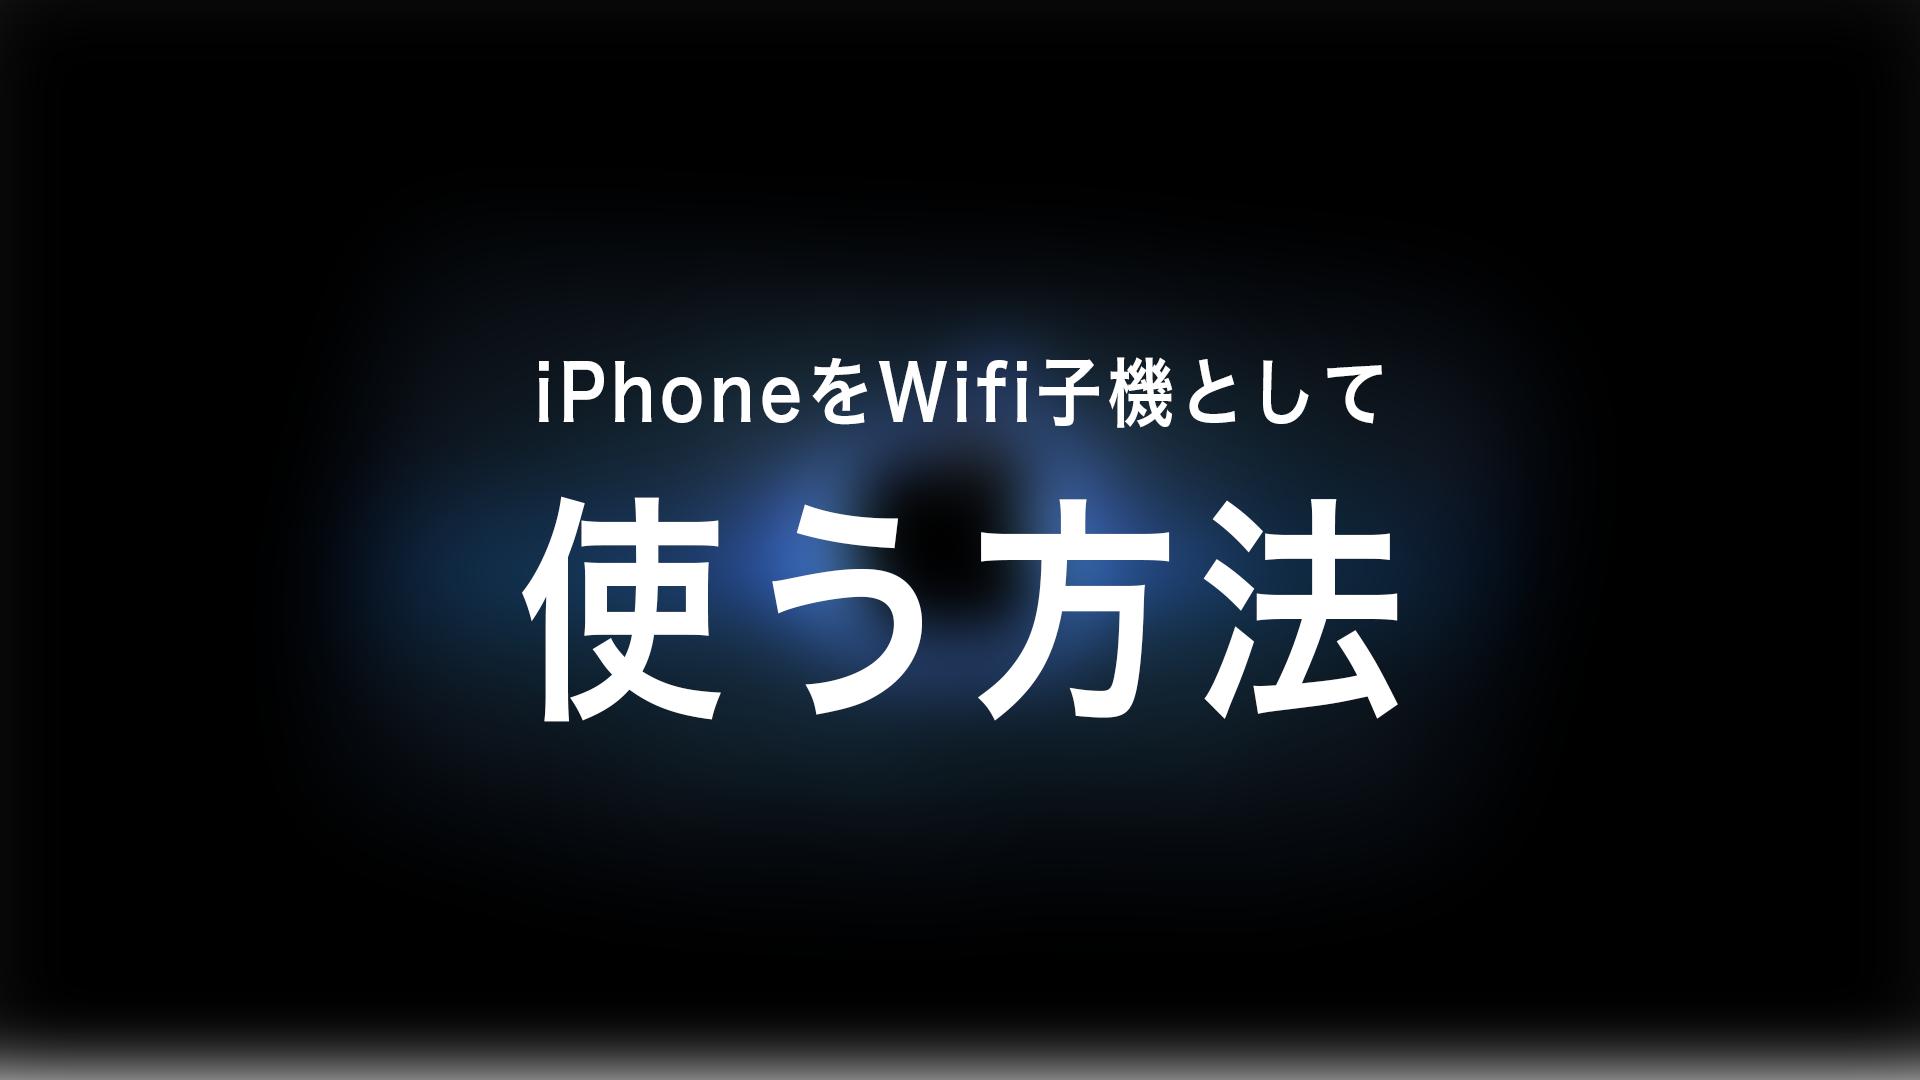 iphonewifi - 【要脱獄】iPhoneをWifi子機として使う方法【macOS】